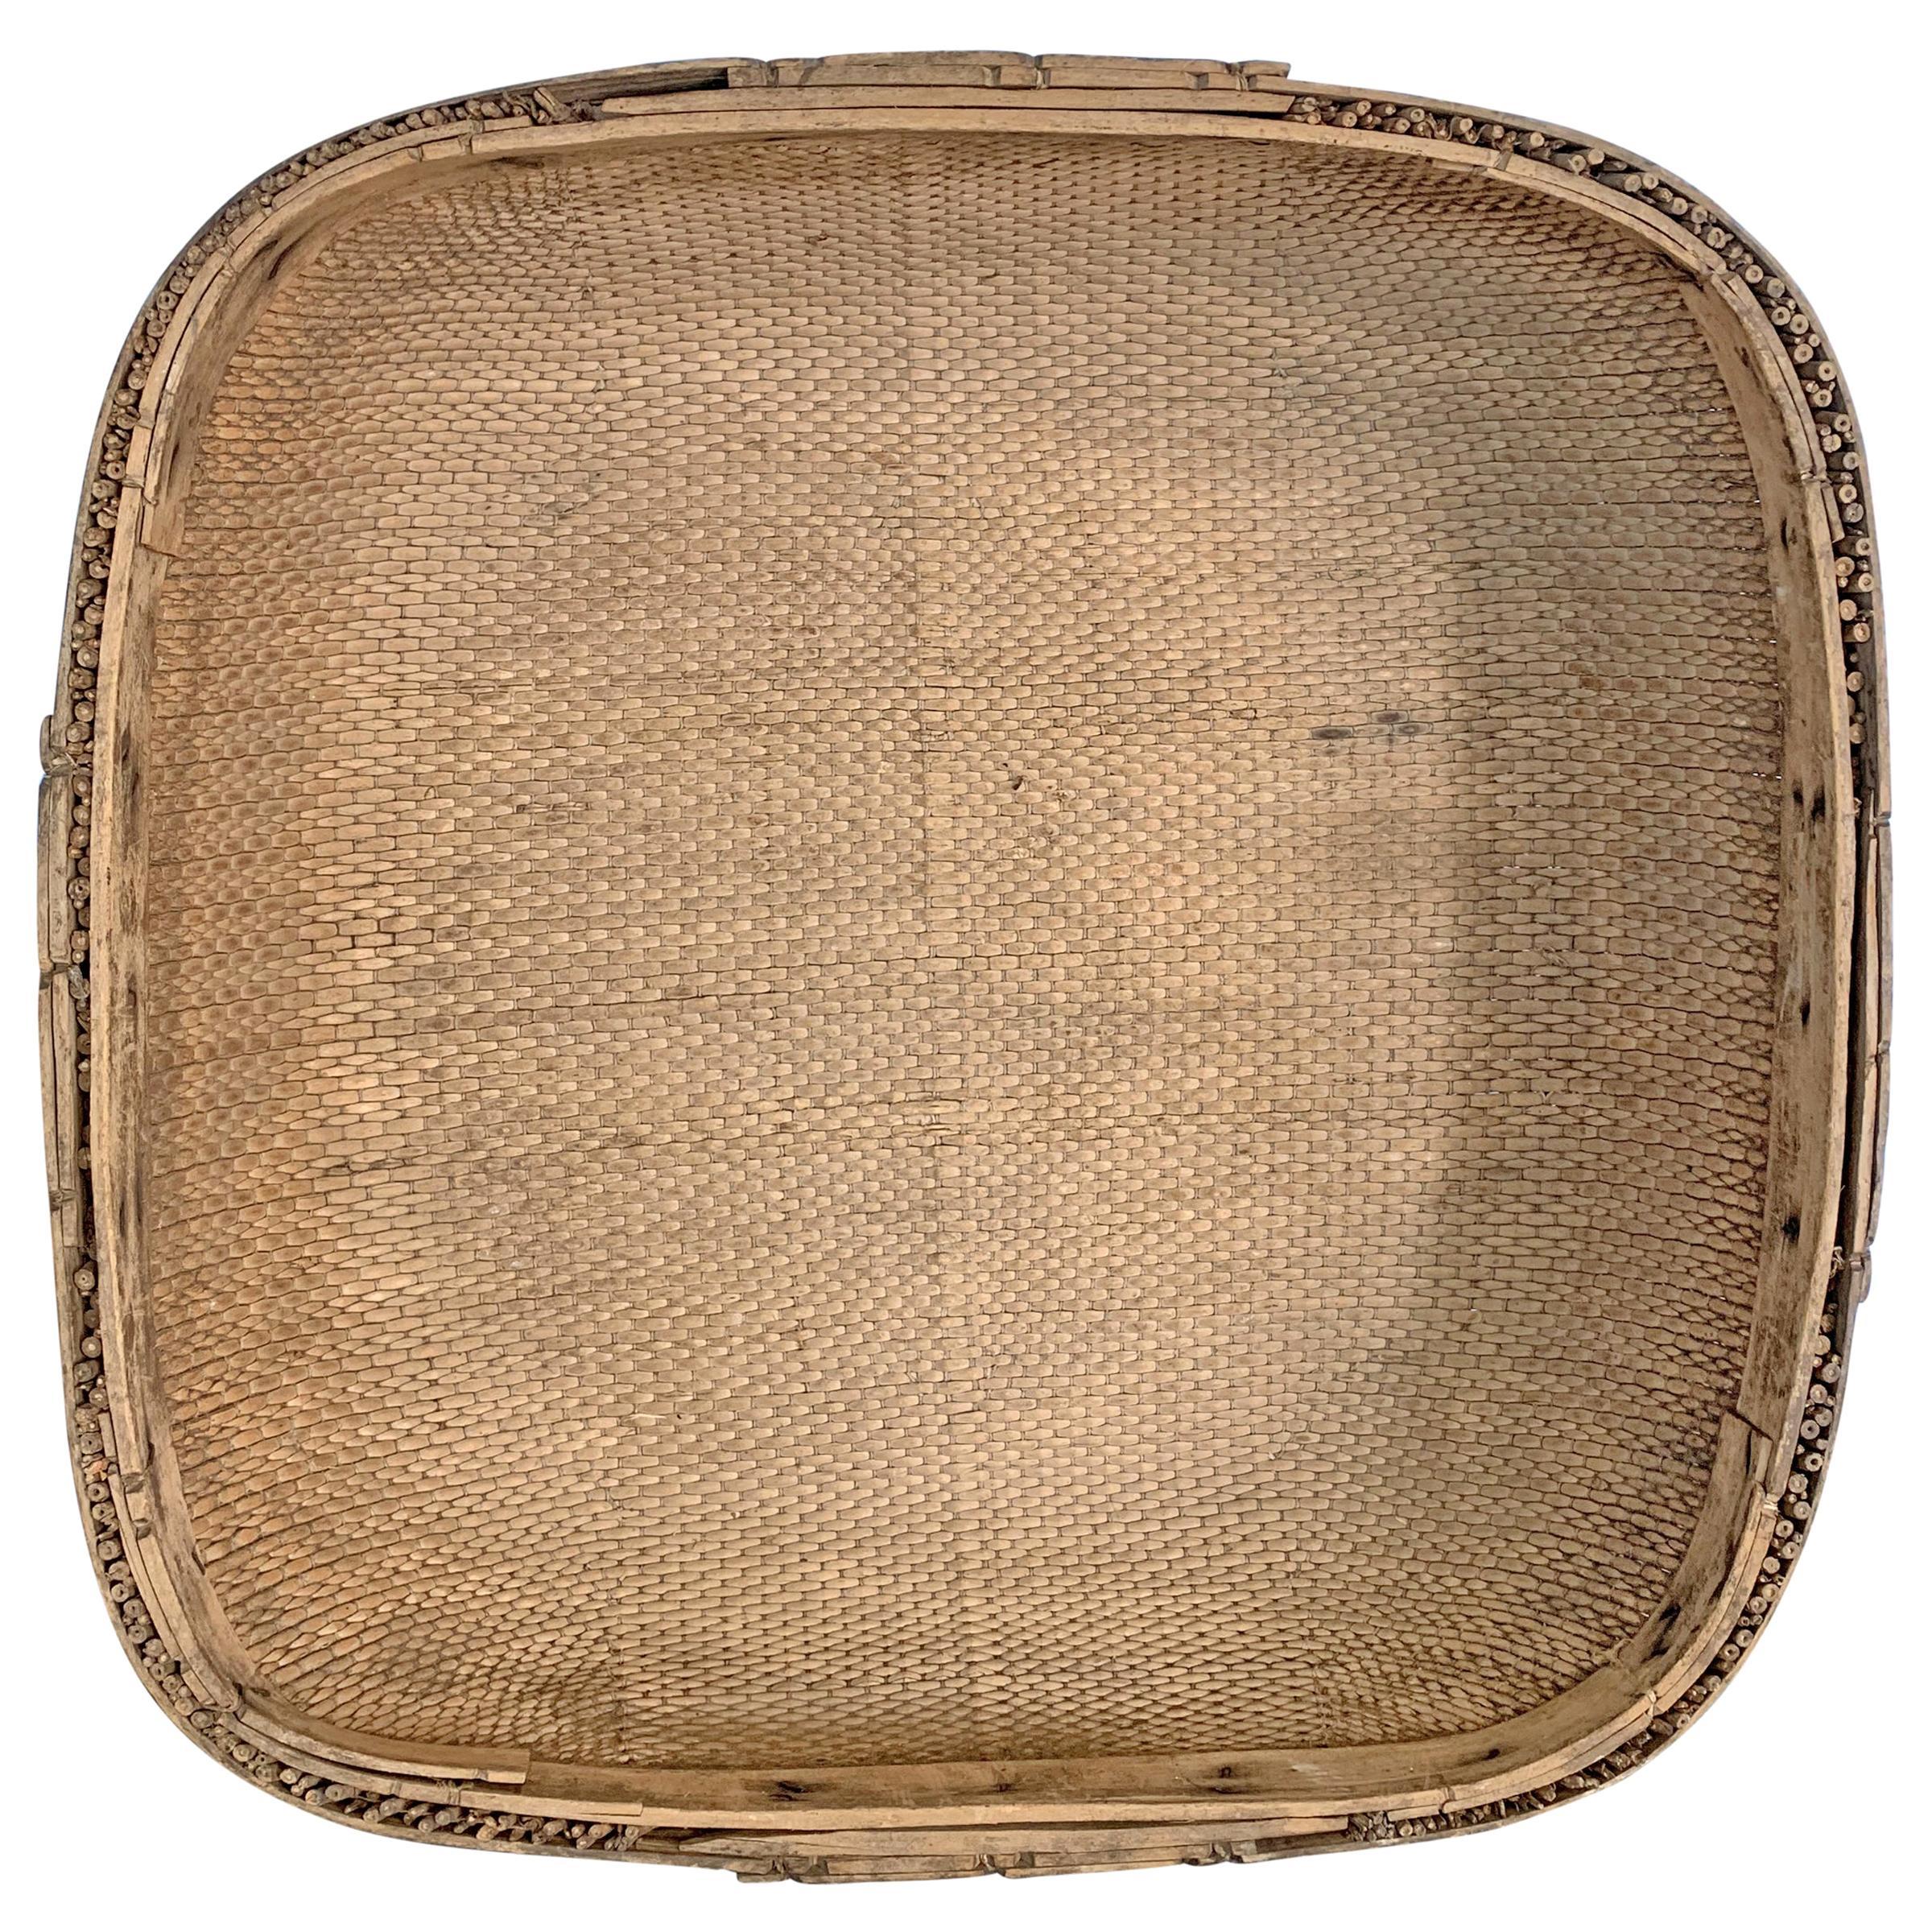 Early 20th Century Chinese Winnowing Basket